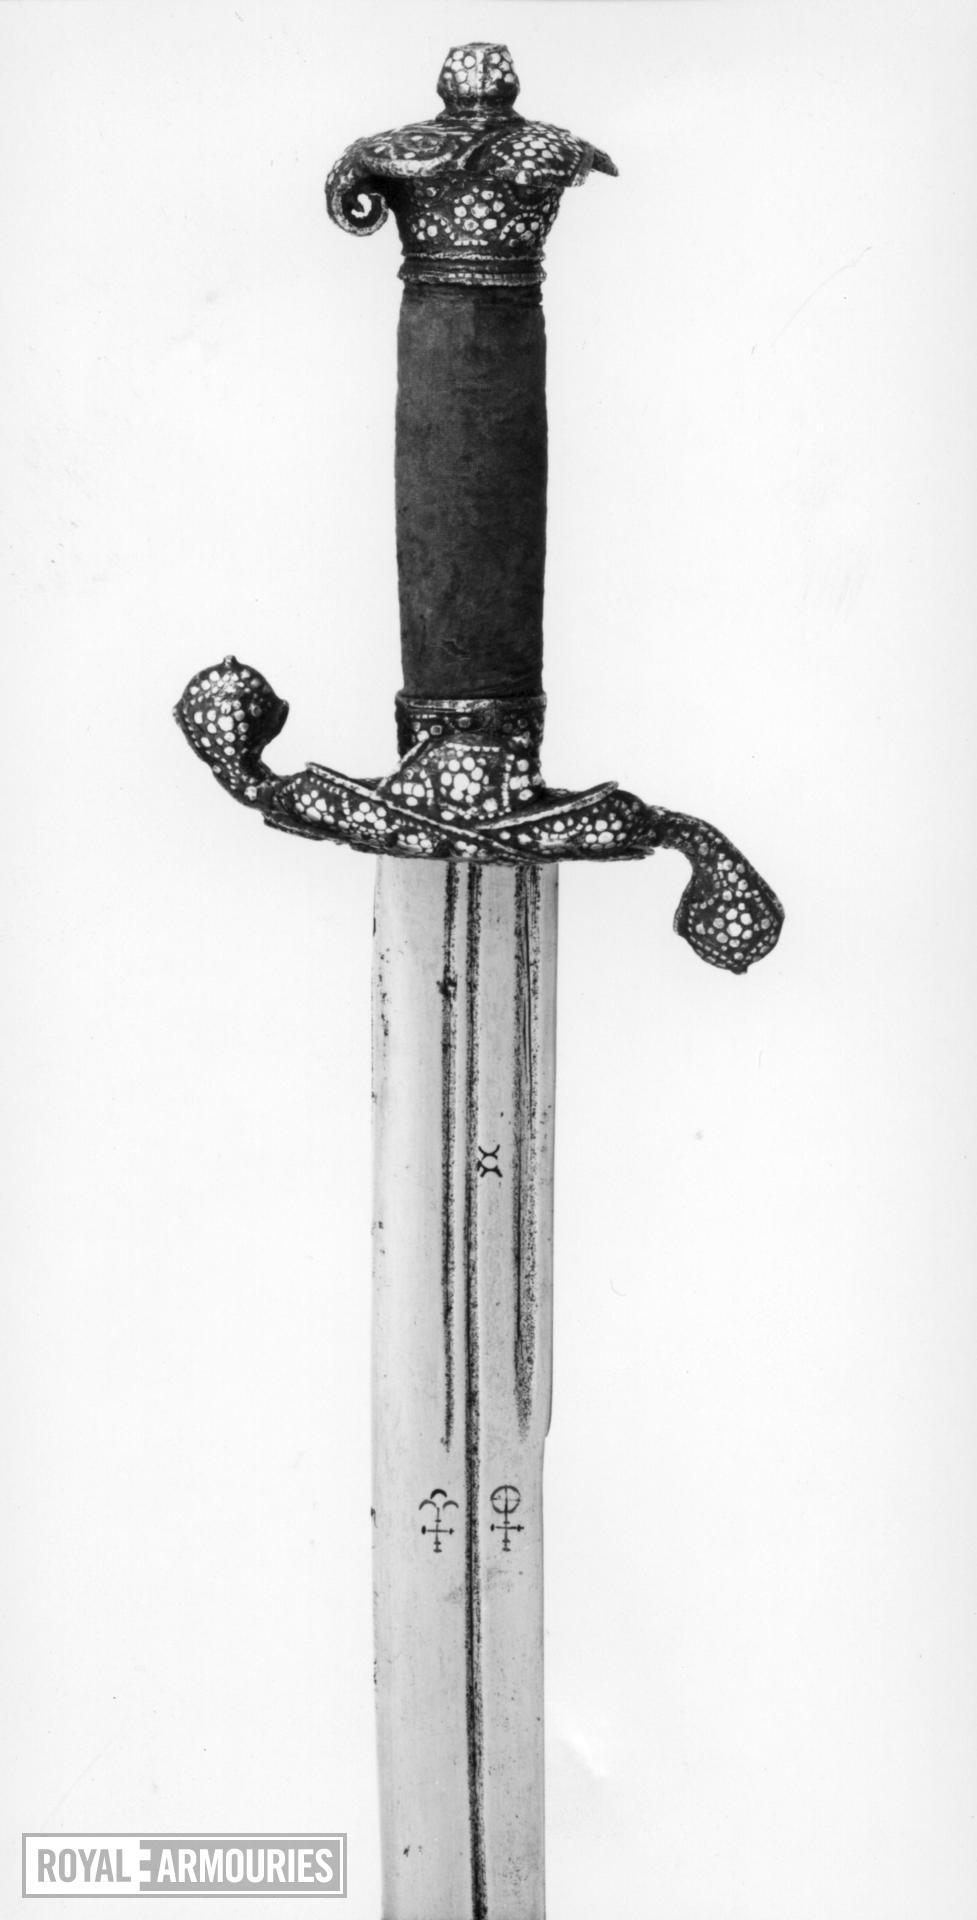 Hanger Hanger with German blade, probably Solingen